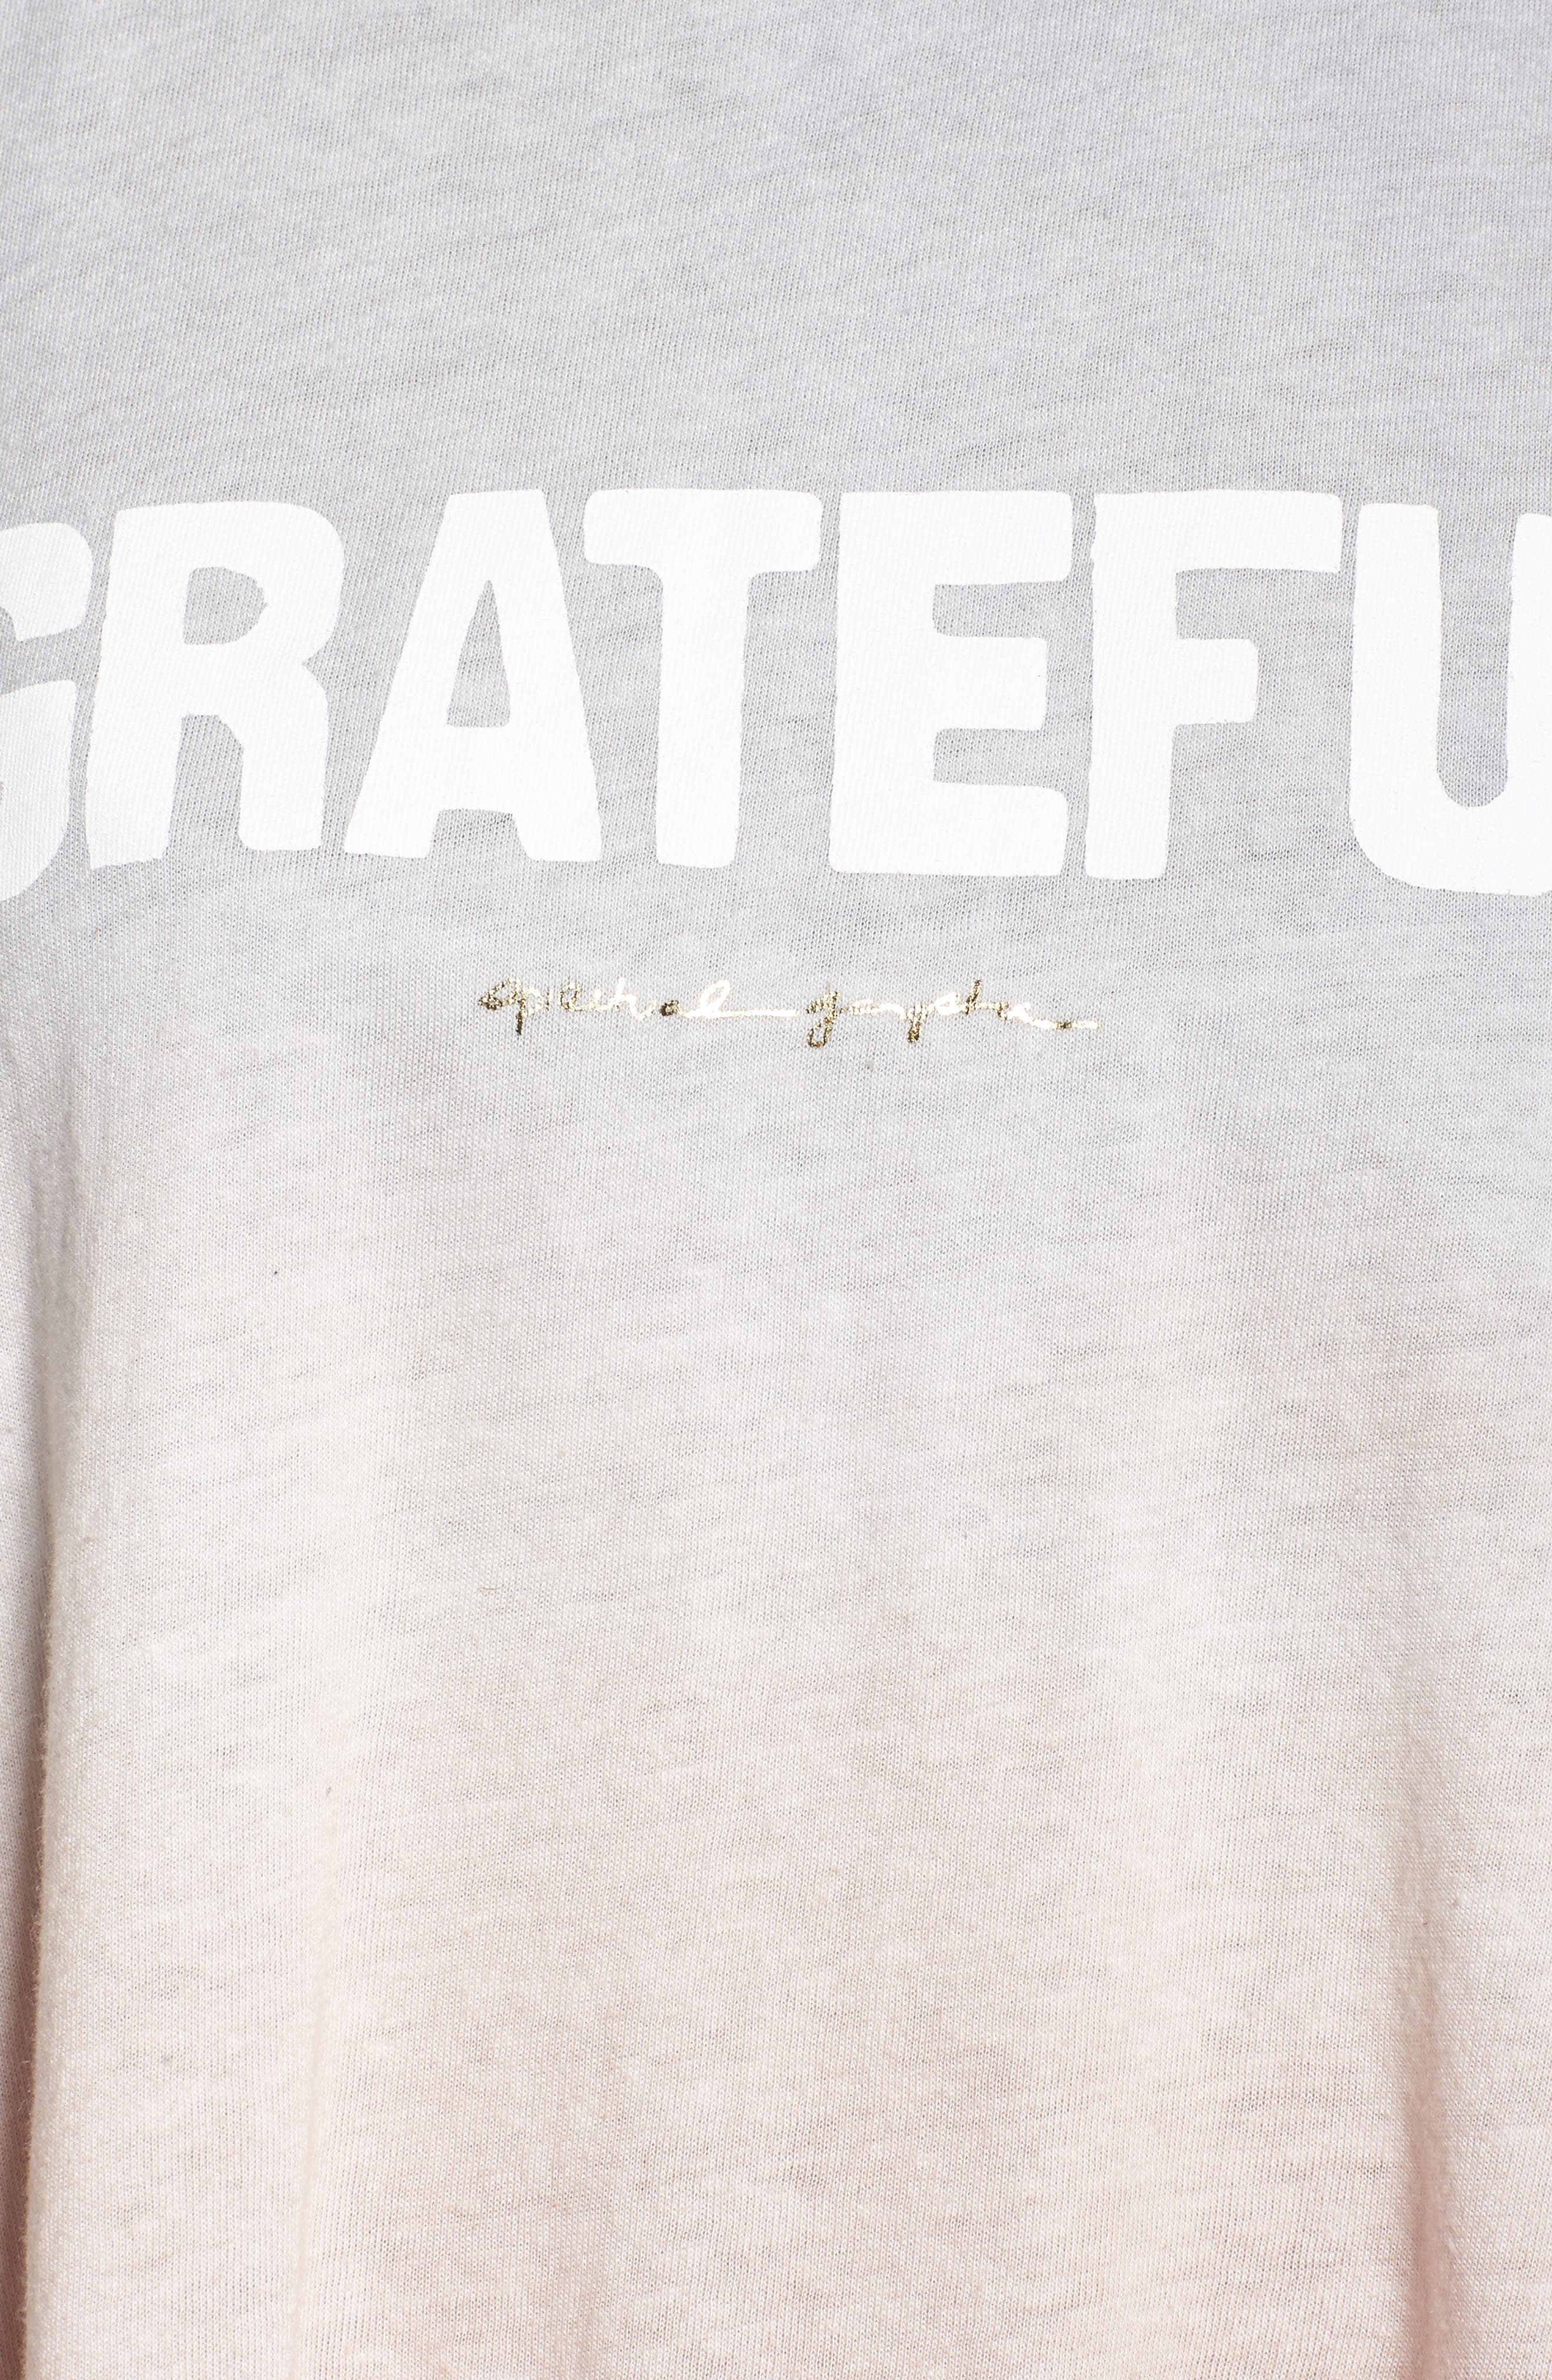 Grateful Graphic Tank,                             Alternate thumbnail 6, color,                             400